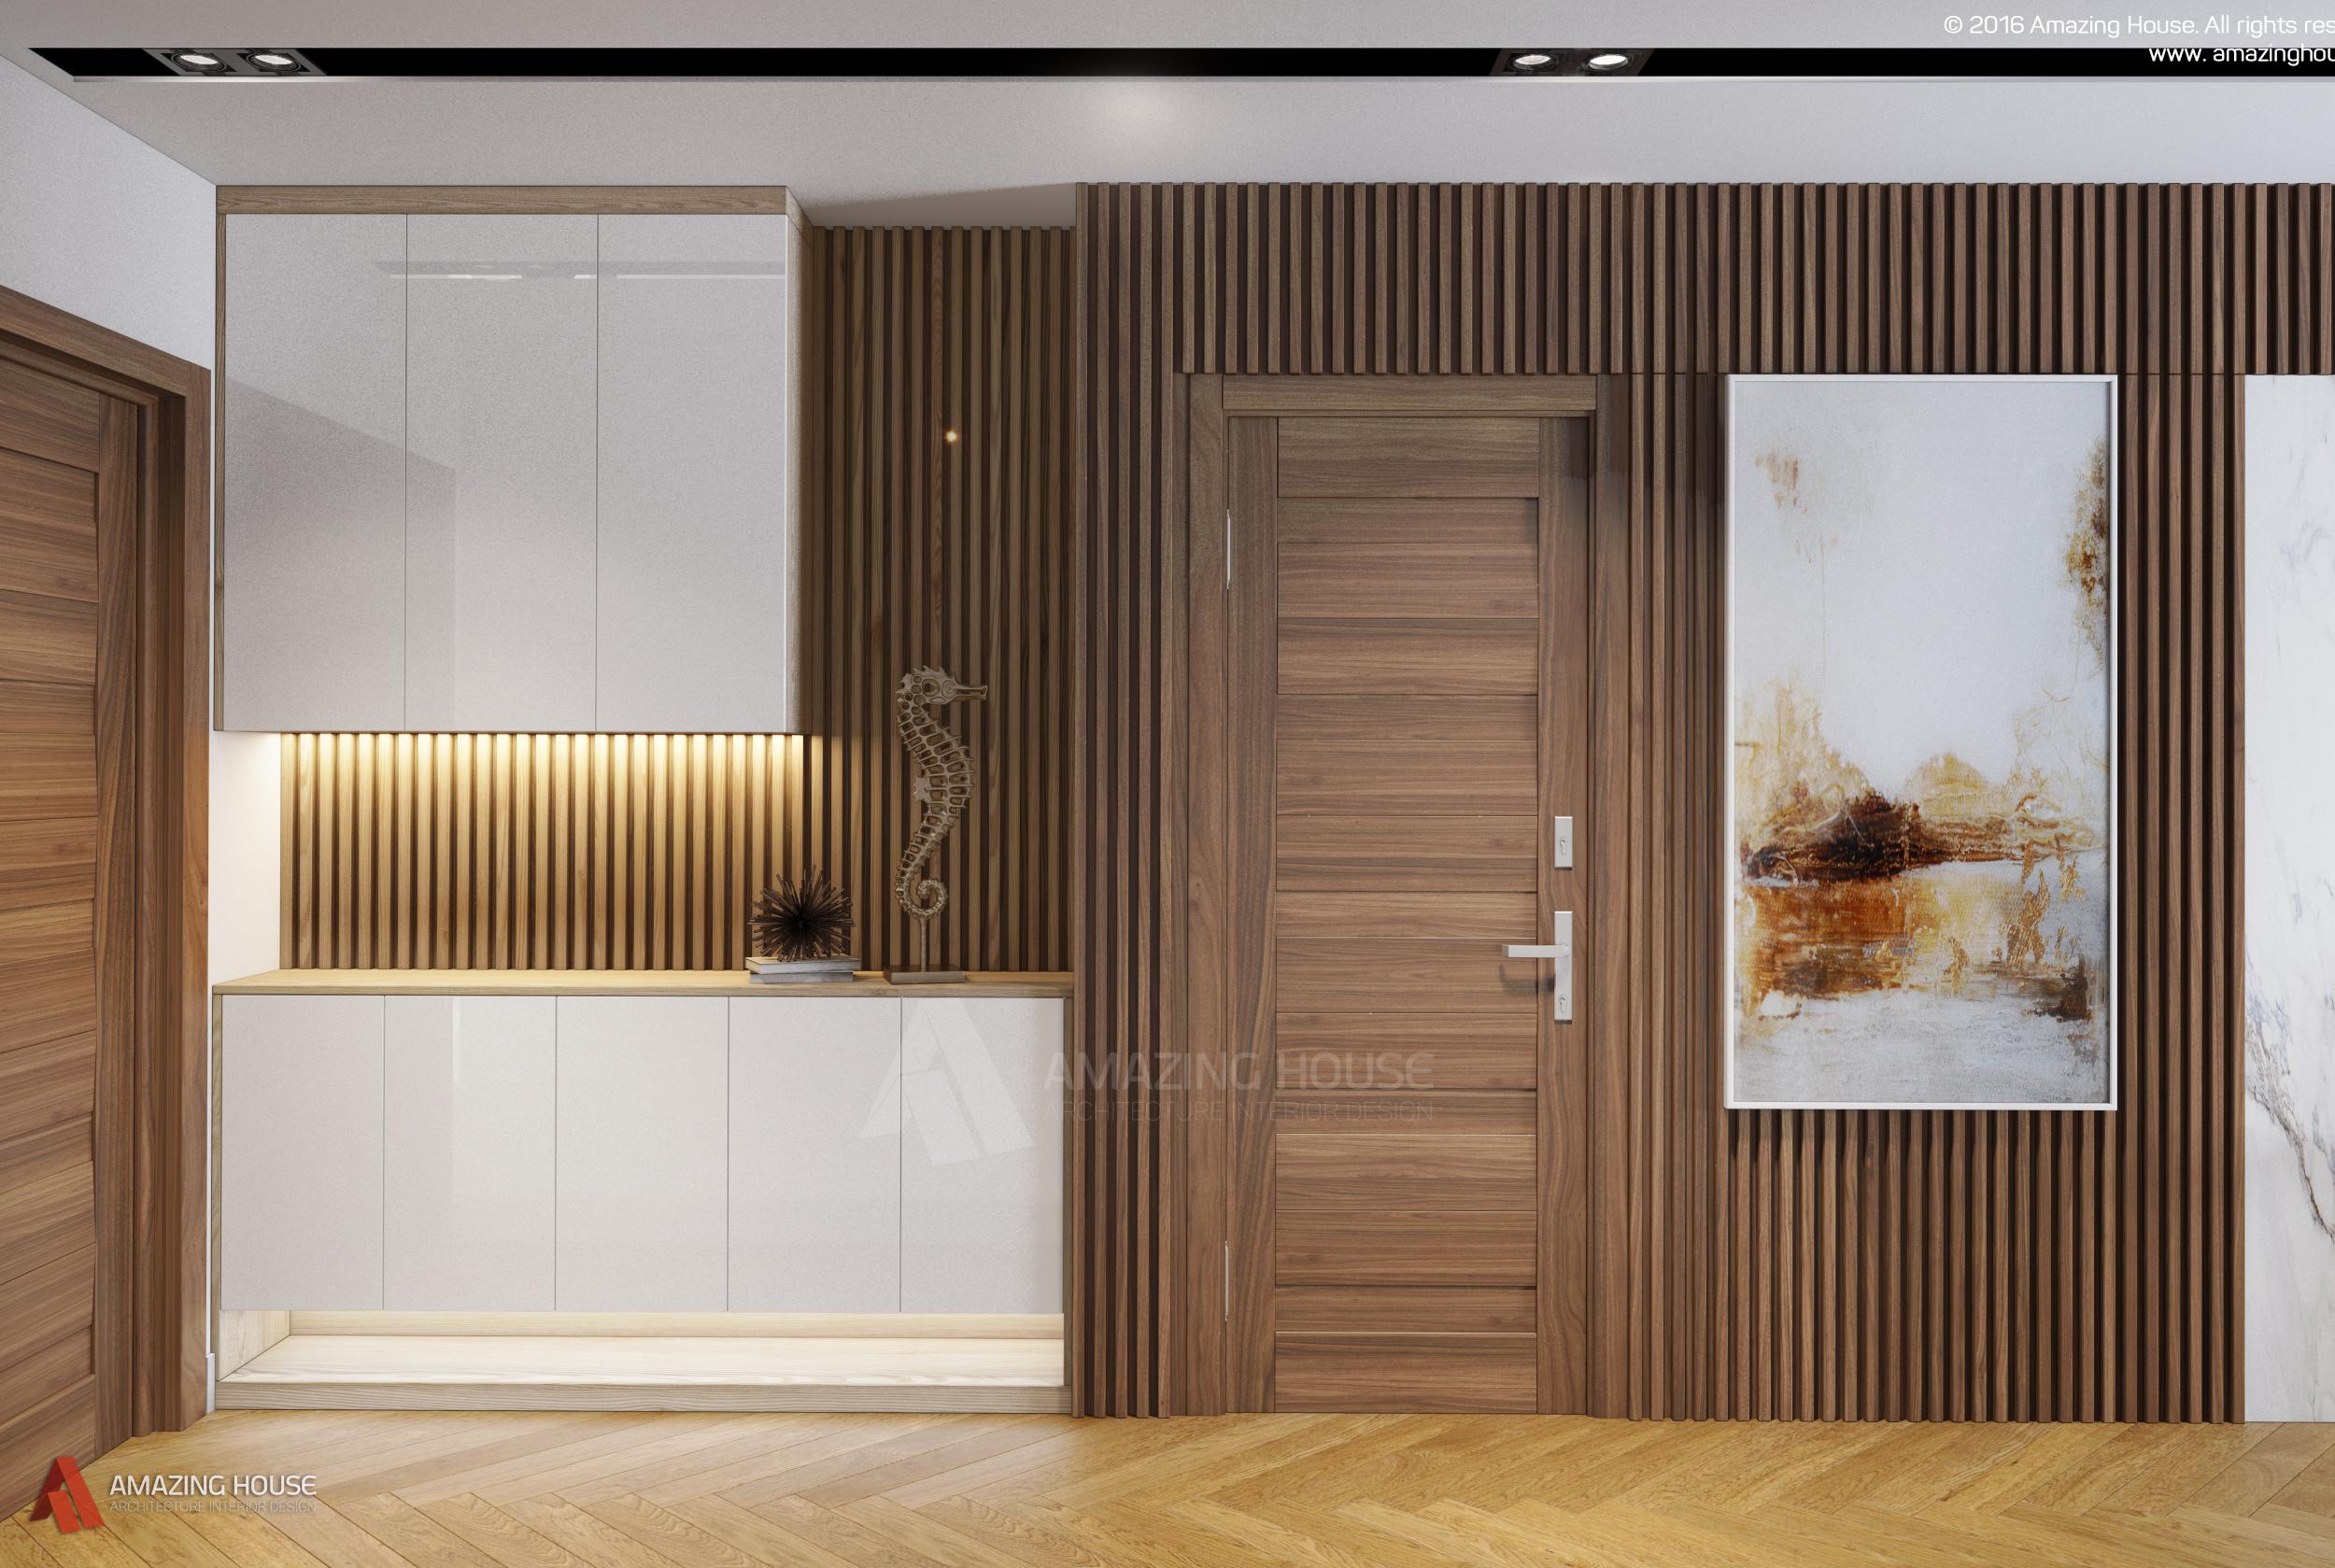 Thiết kế căn hộ gia đình anh Linh tại D' Le Roi Soleil Quảng An